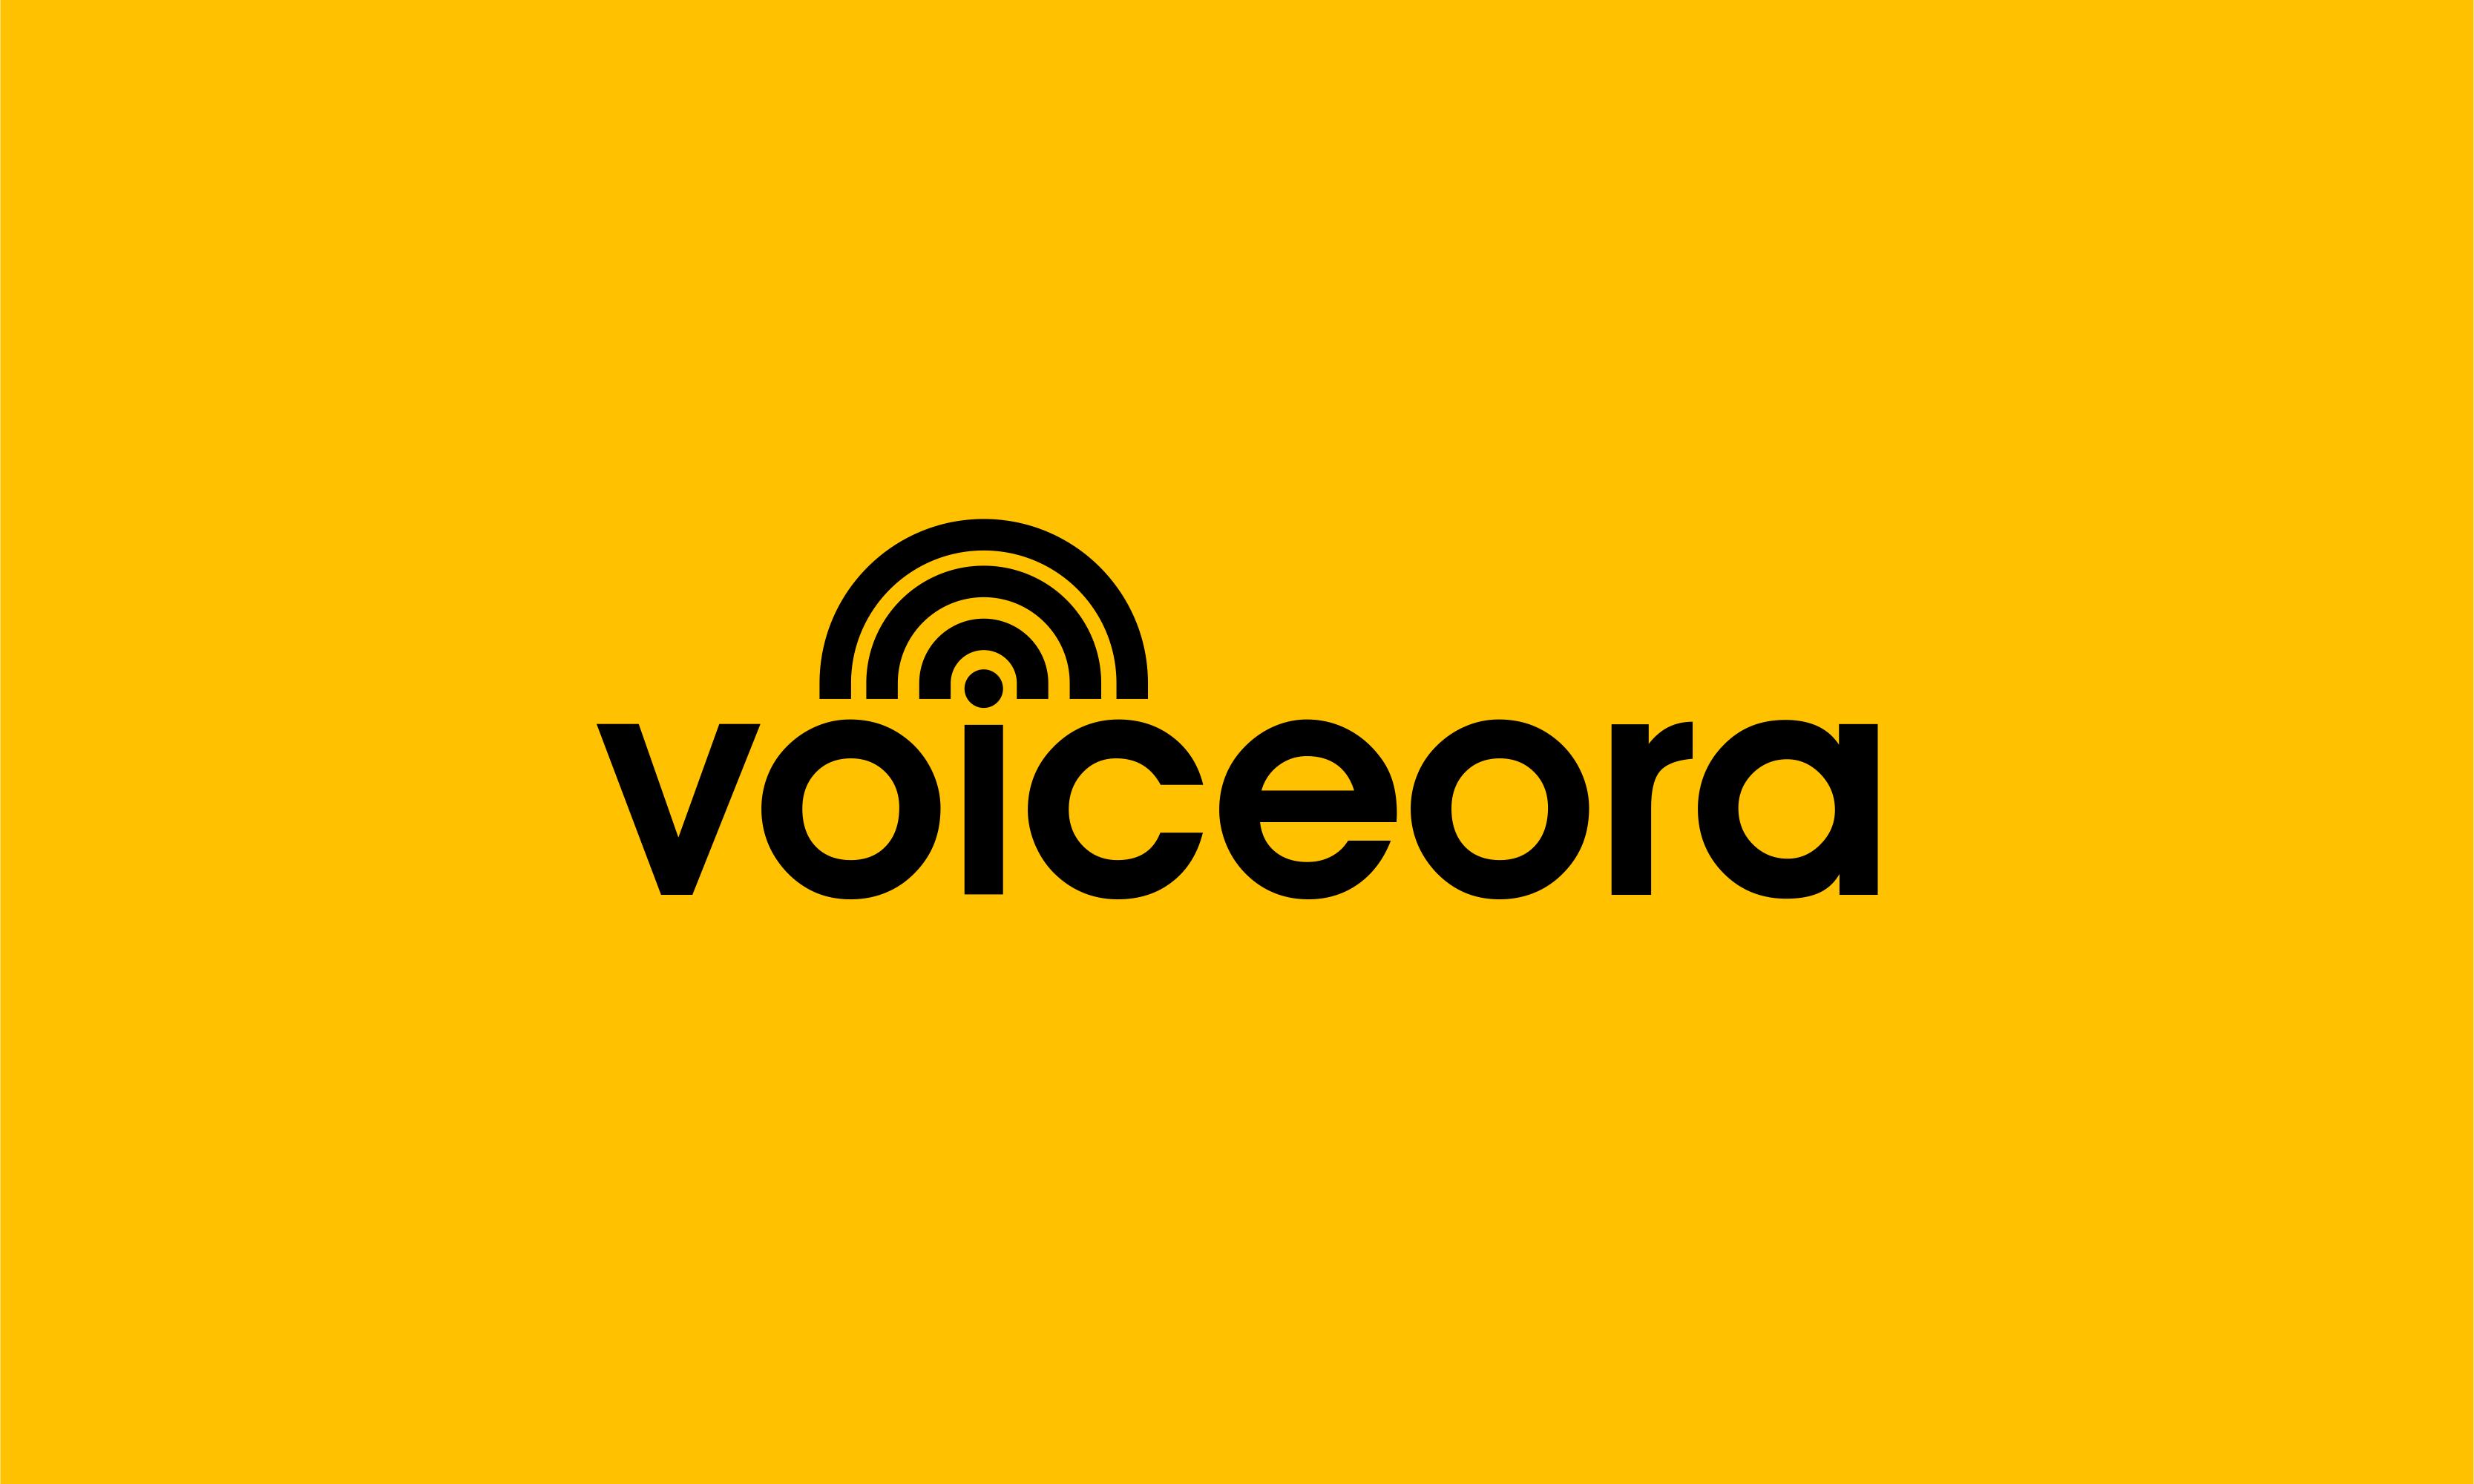 Voiceora